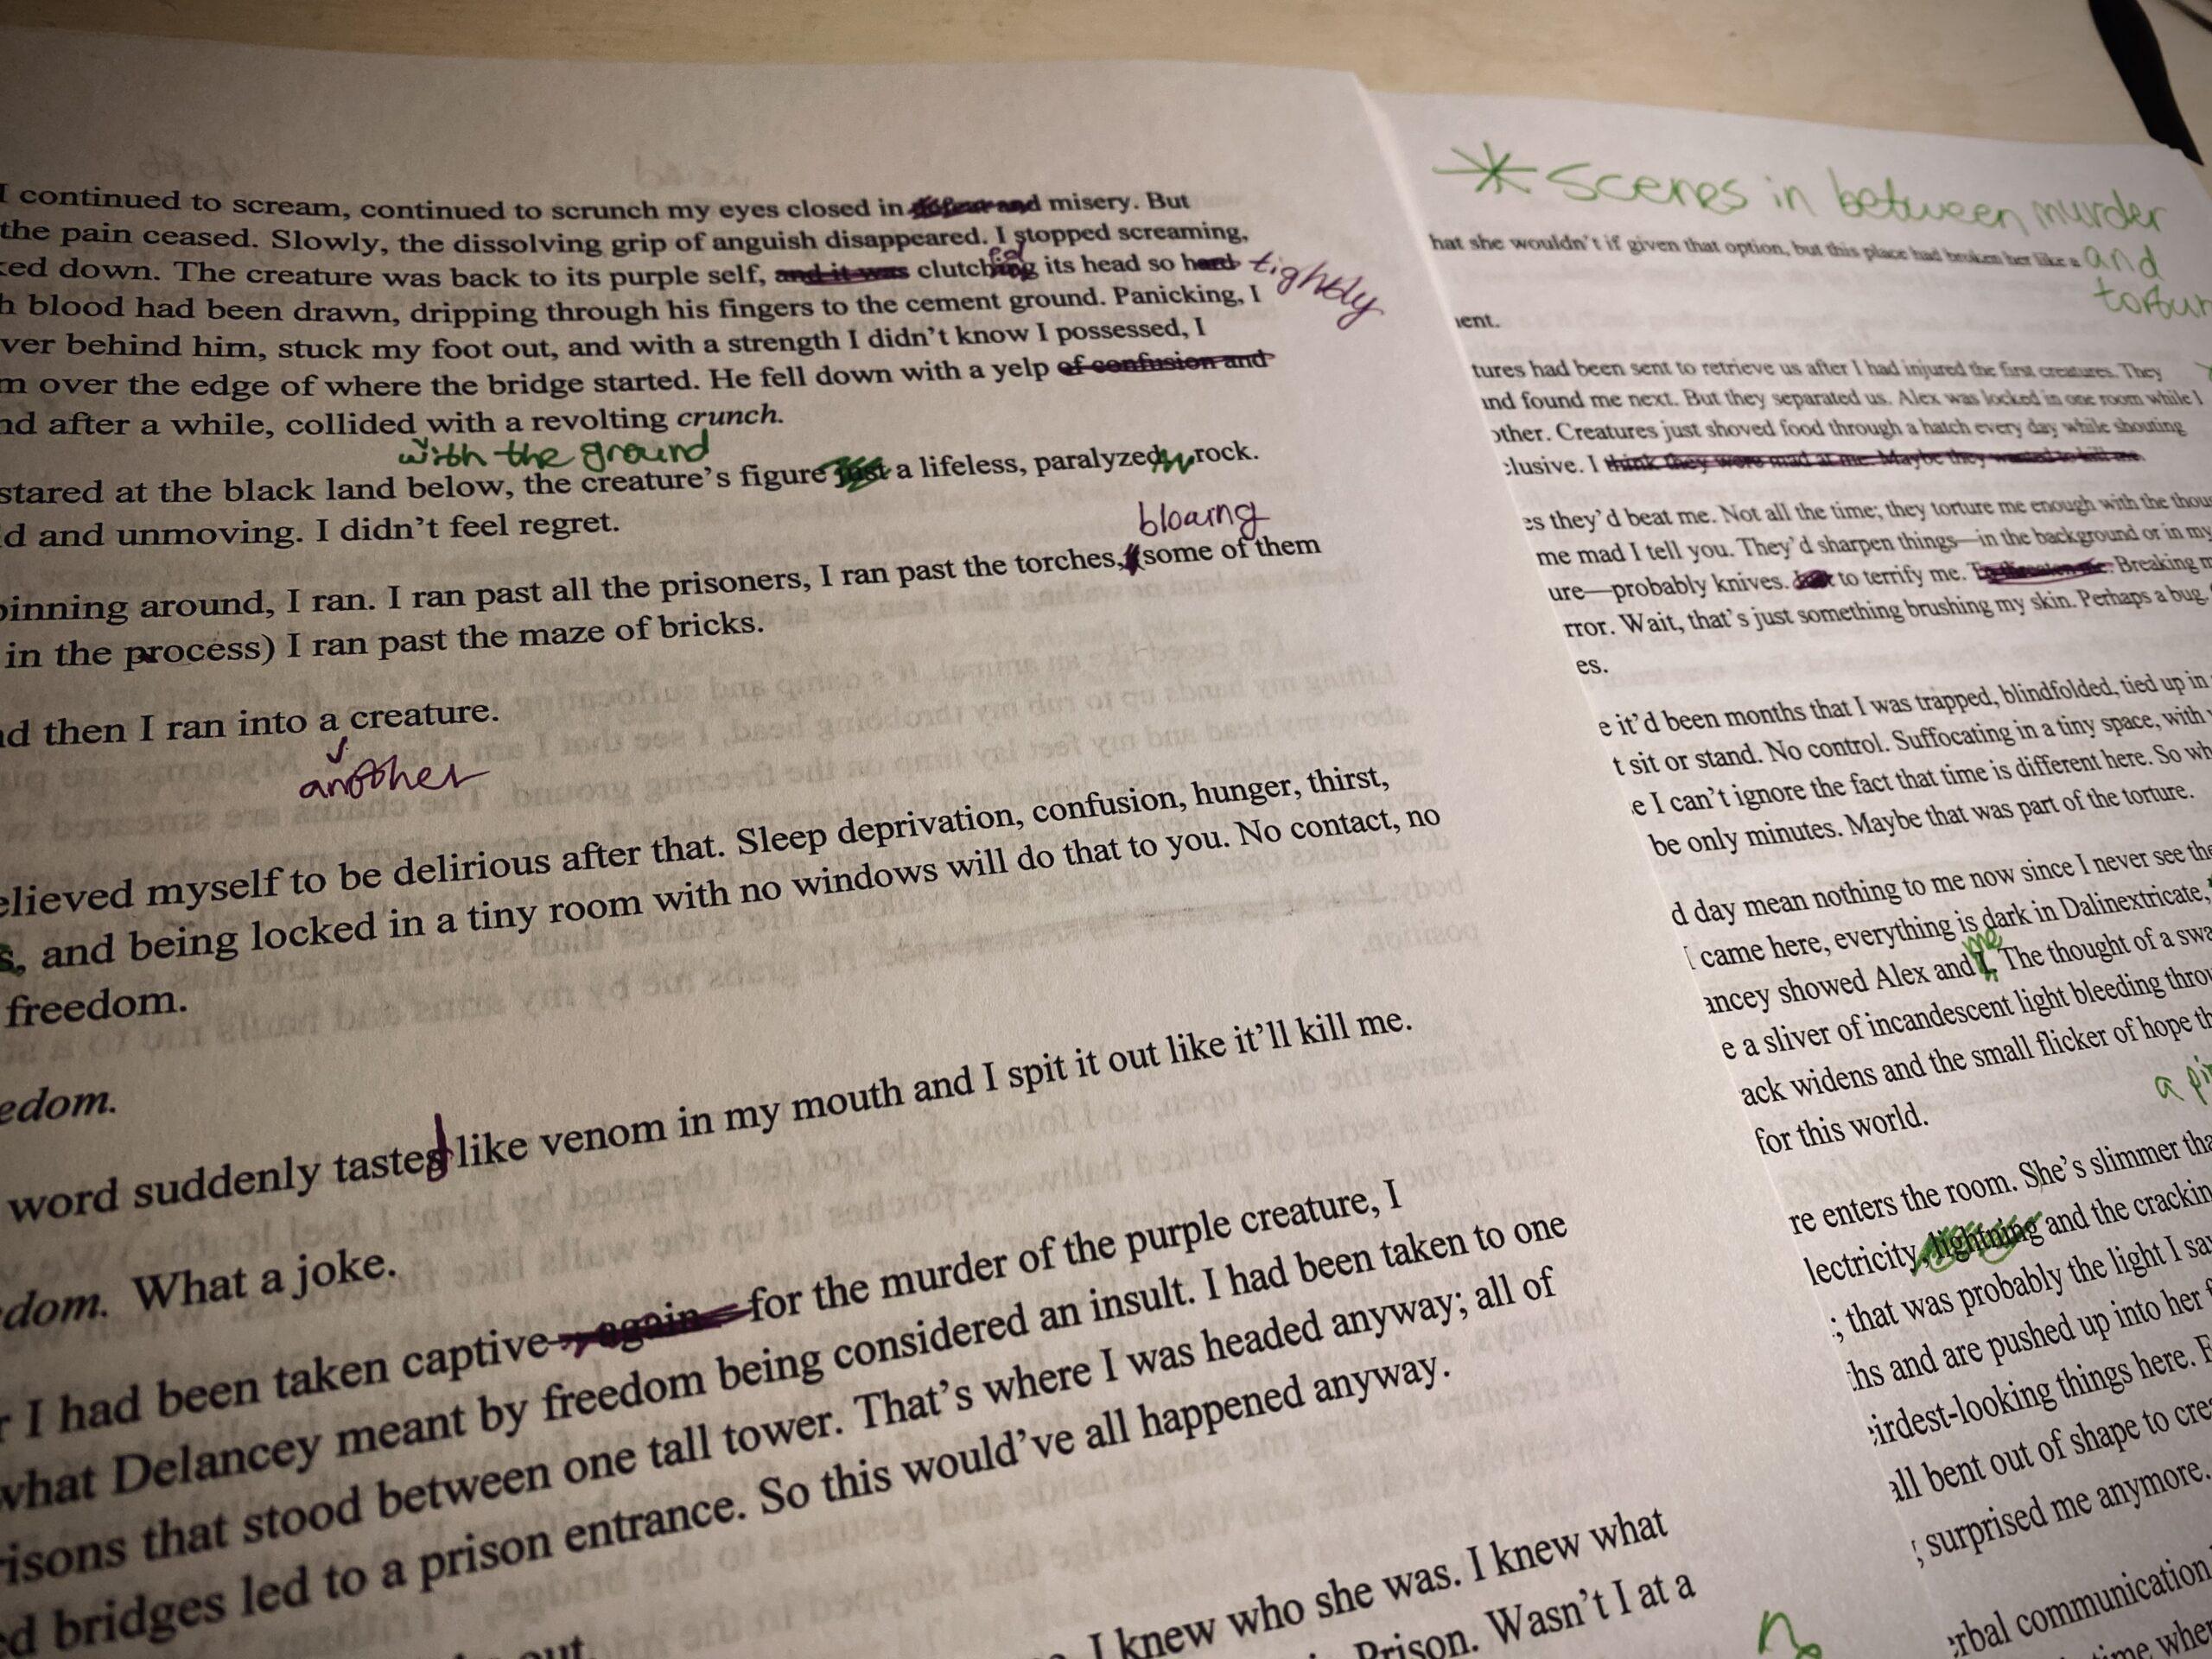 book editing, editing, editors, writing, writing tips, novel writing, manuscript editing, spring cedars publishing